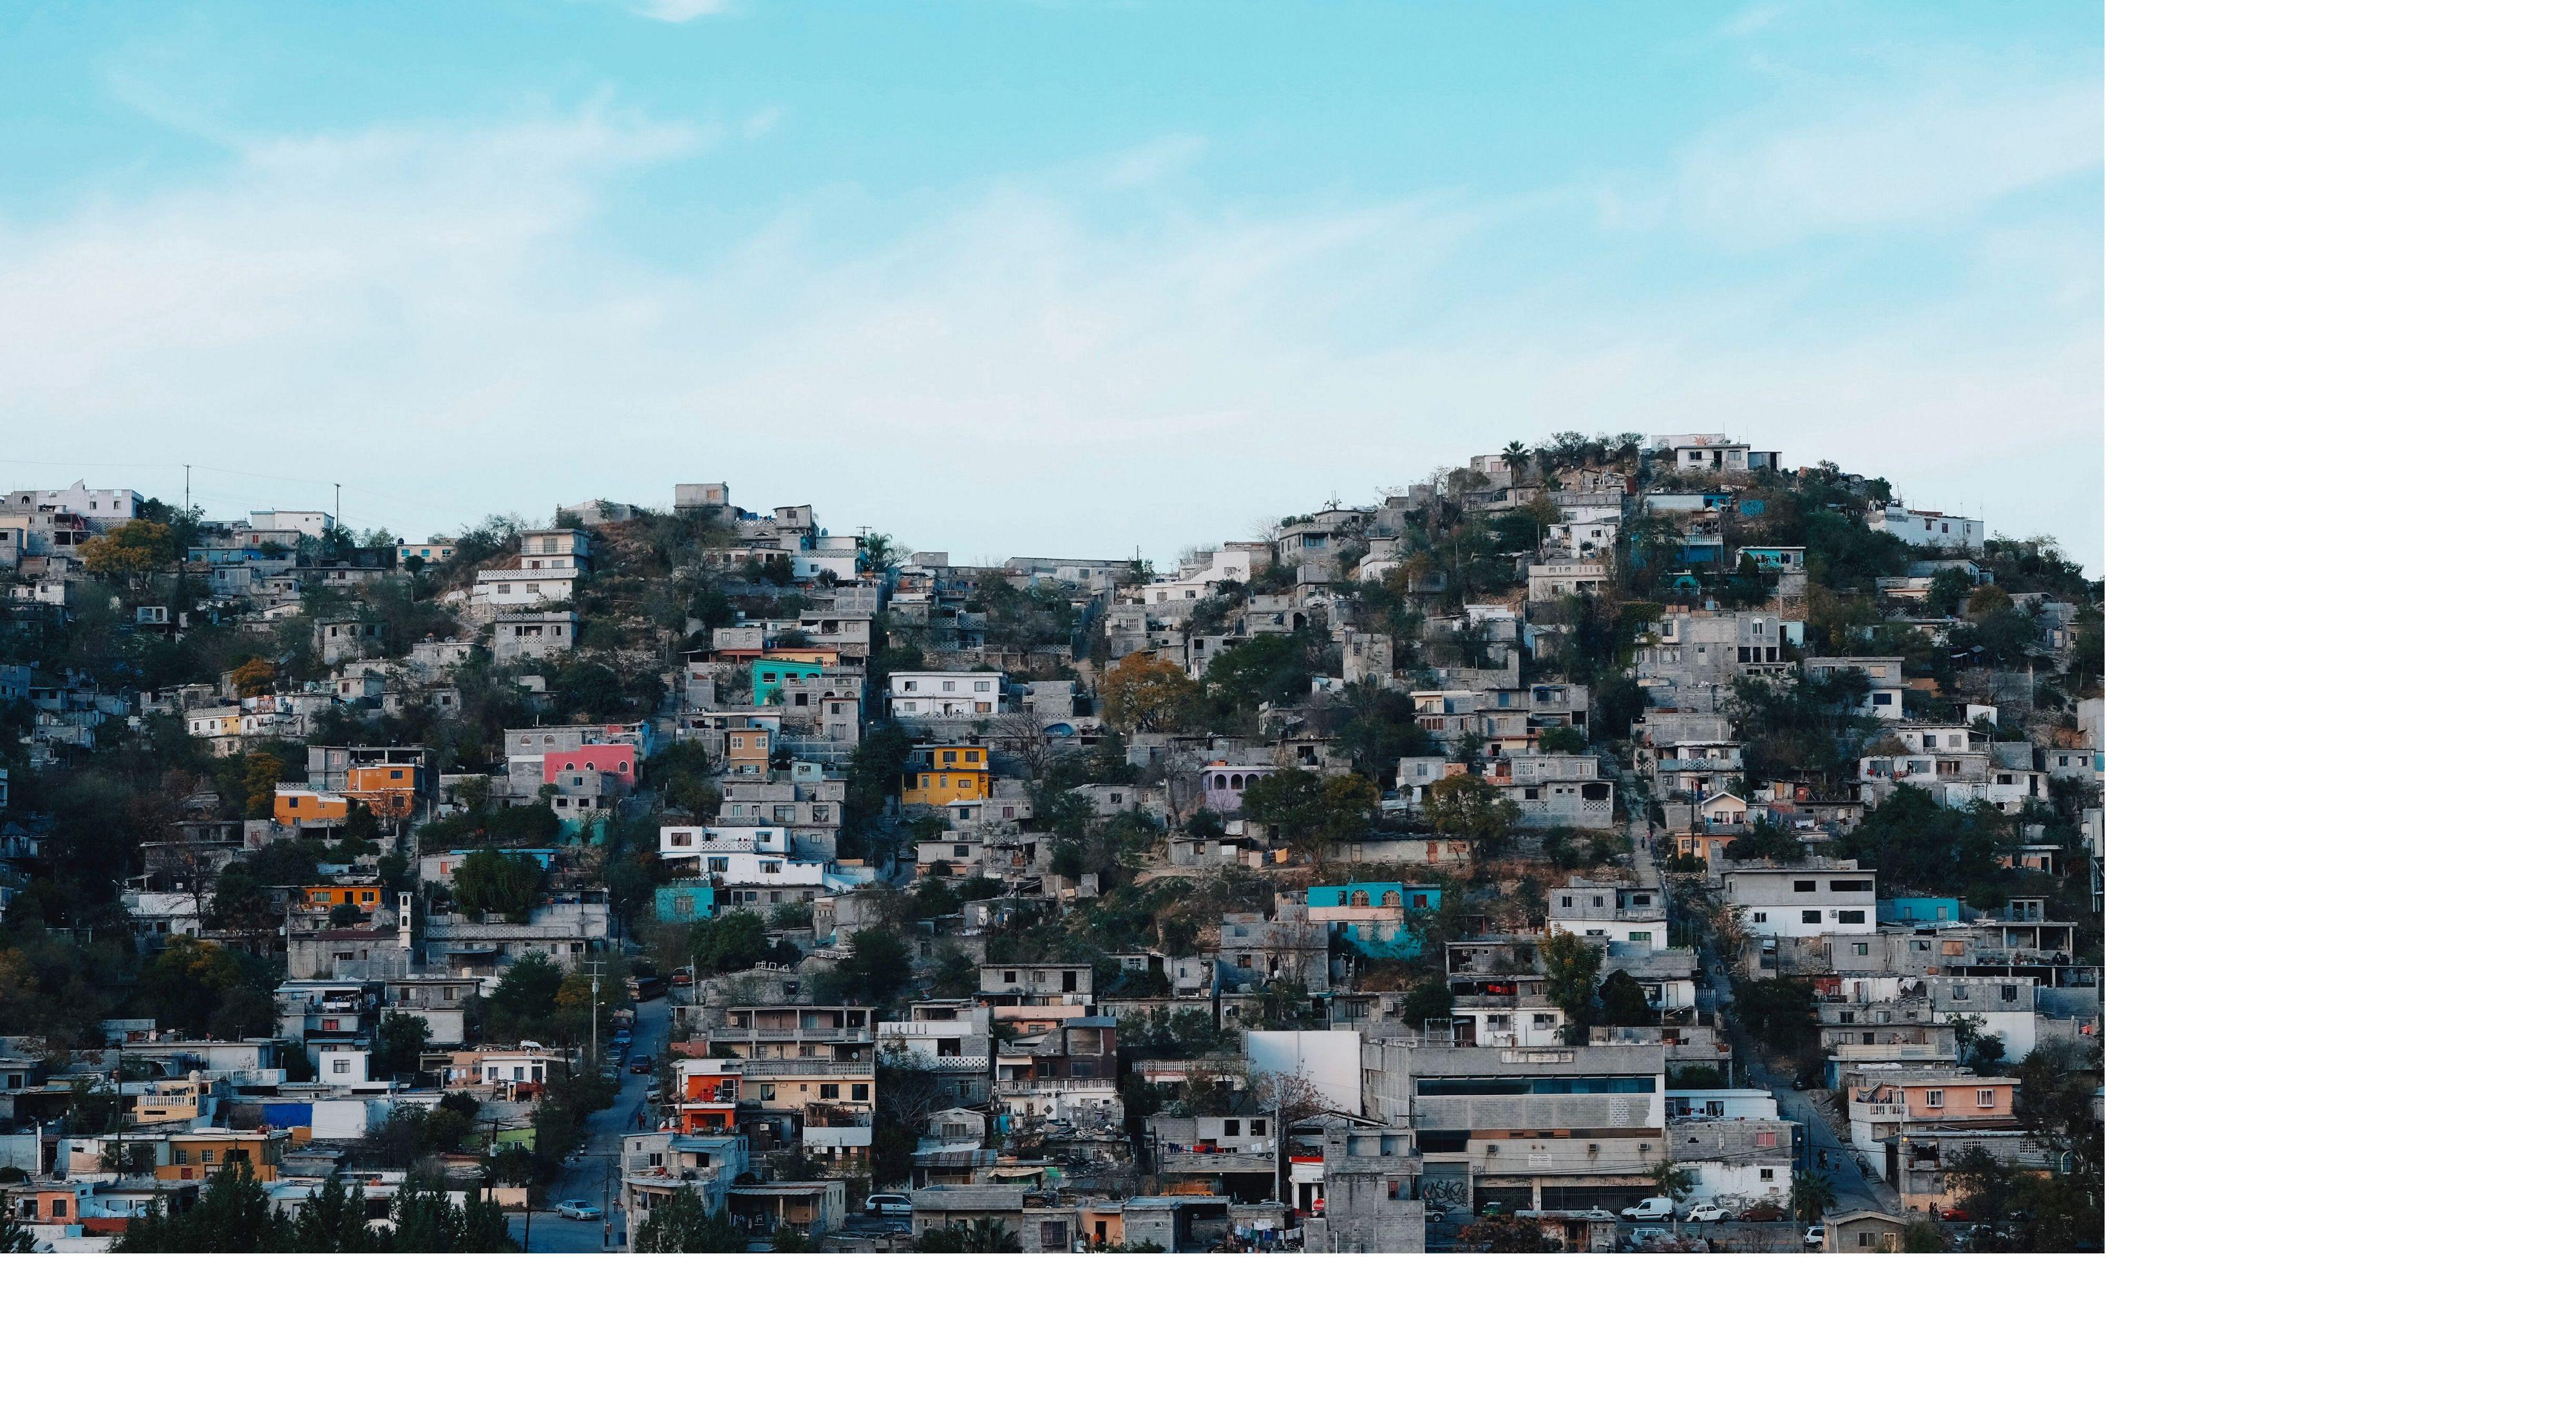 Developed hillsides loom over the city of Monterrey.